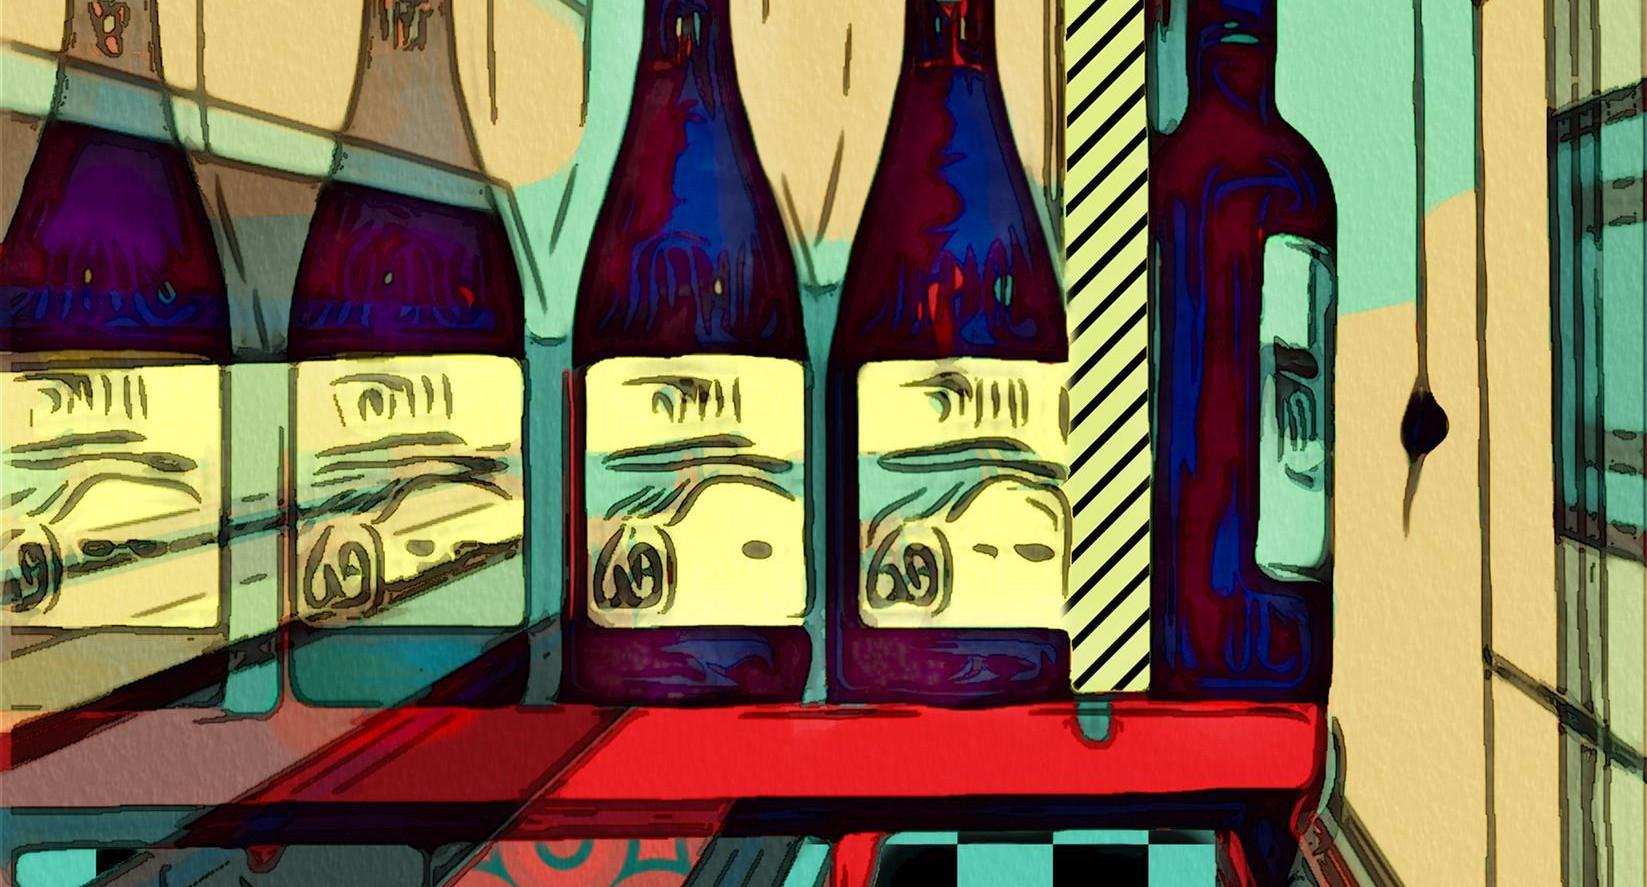 The Wine Cellar by Rita Colantonio